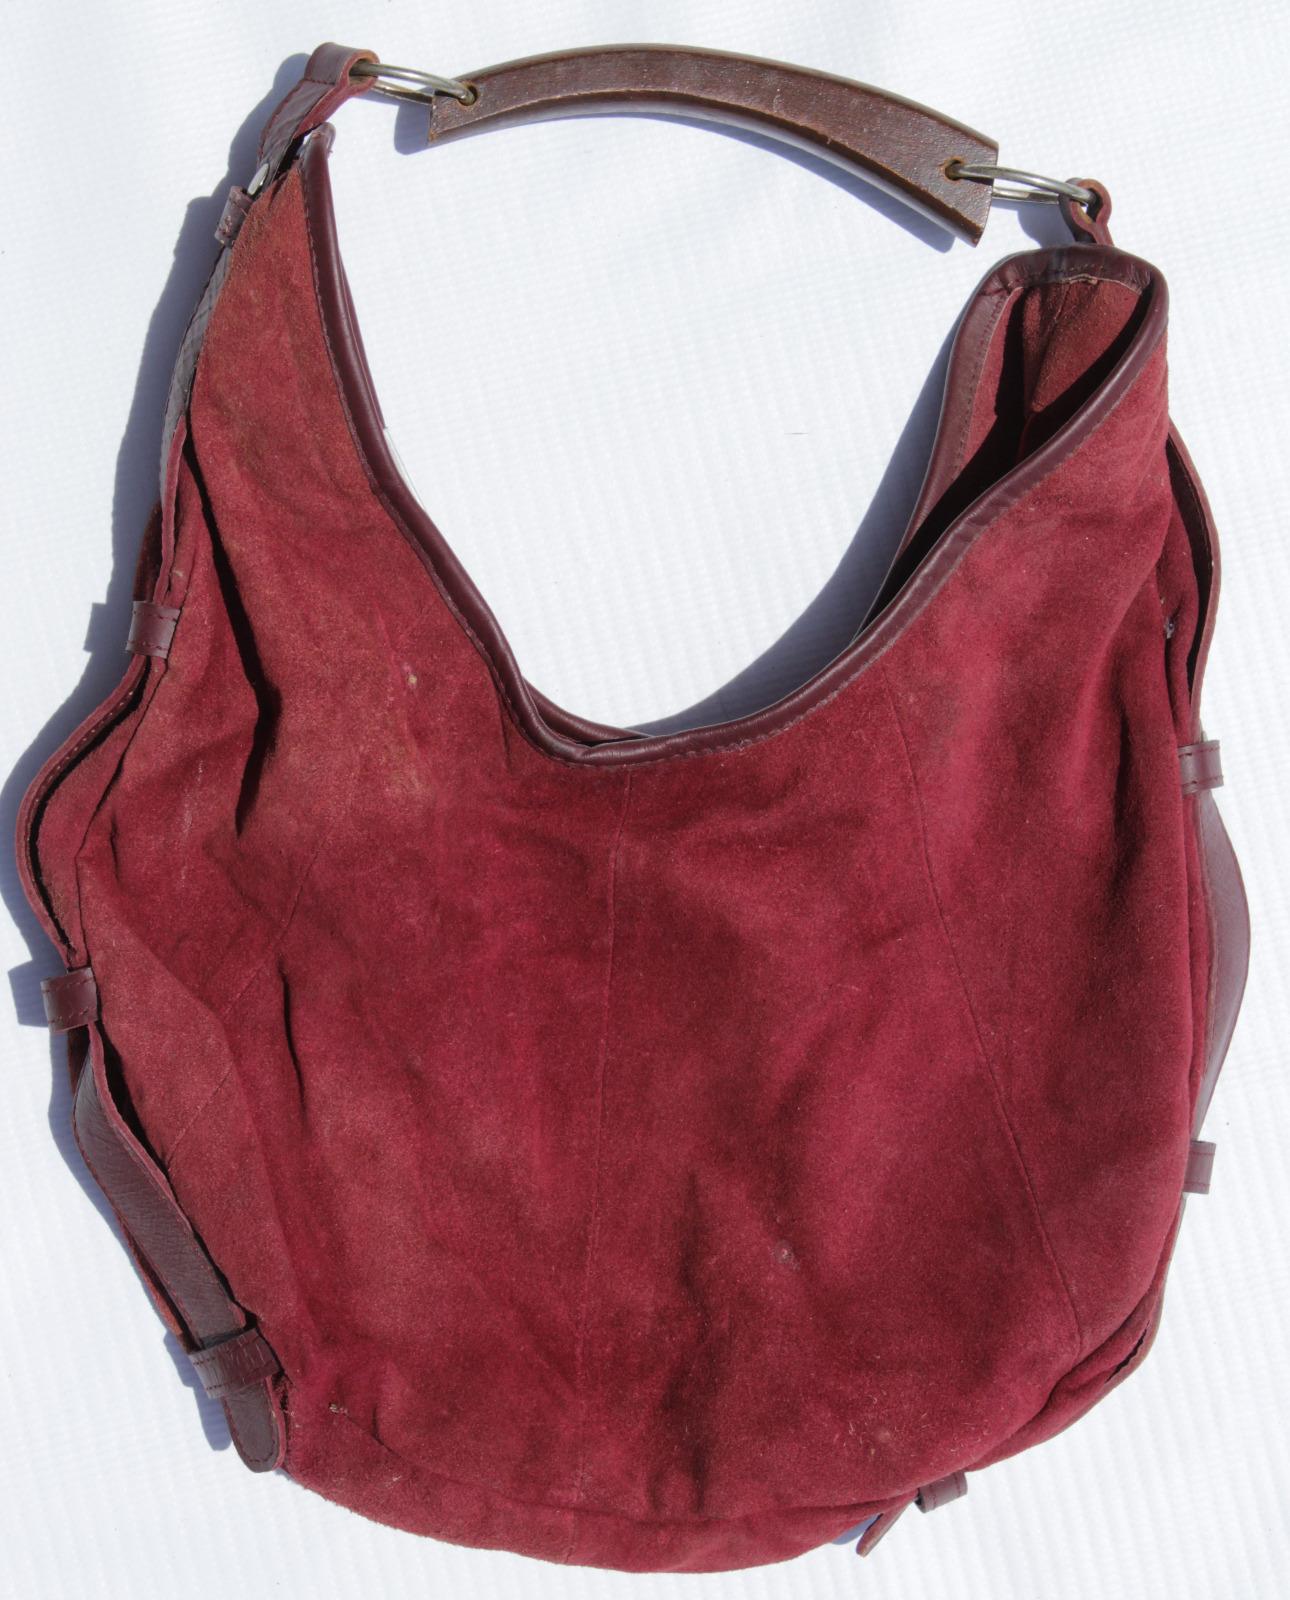 Burgundy Suede Handbag